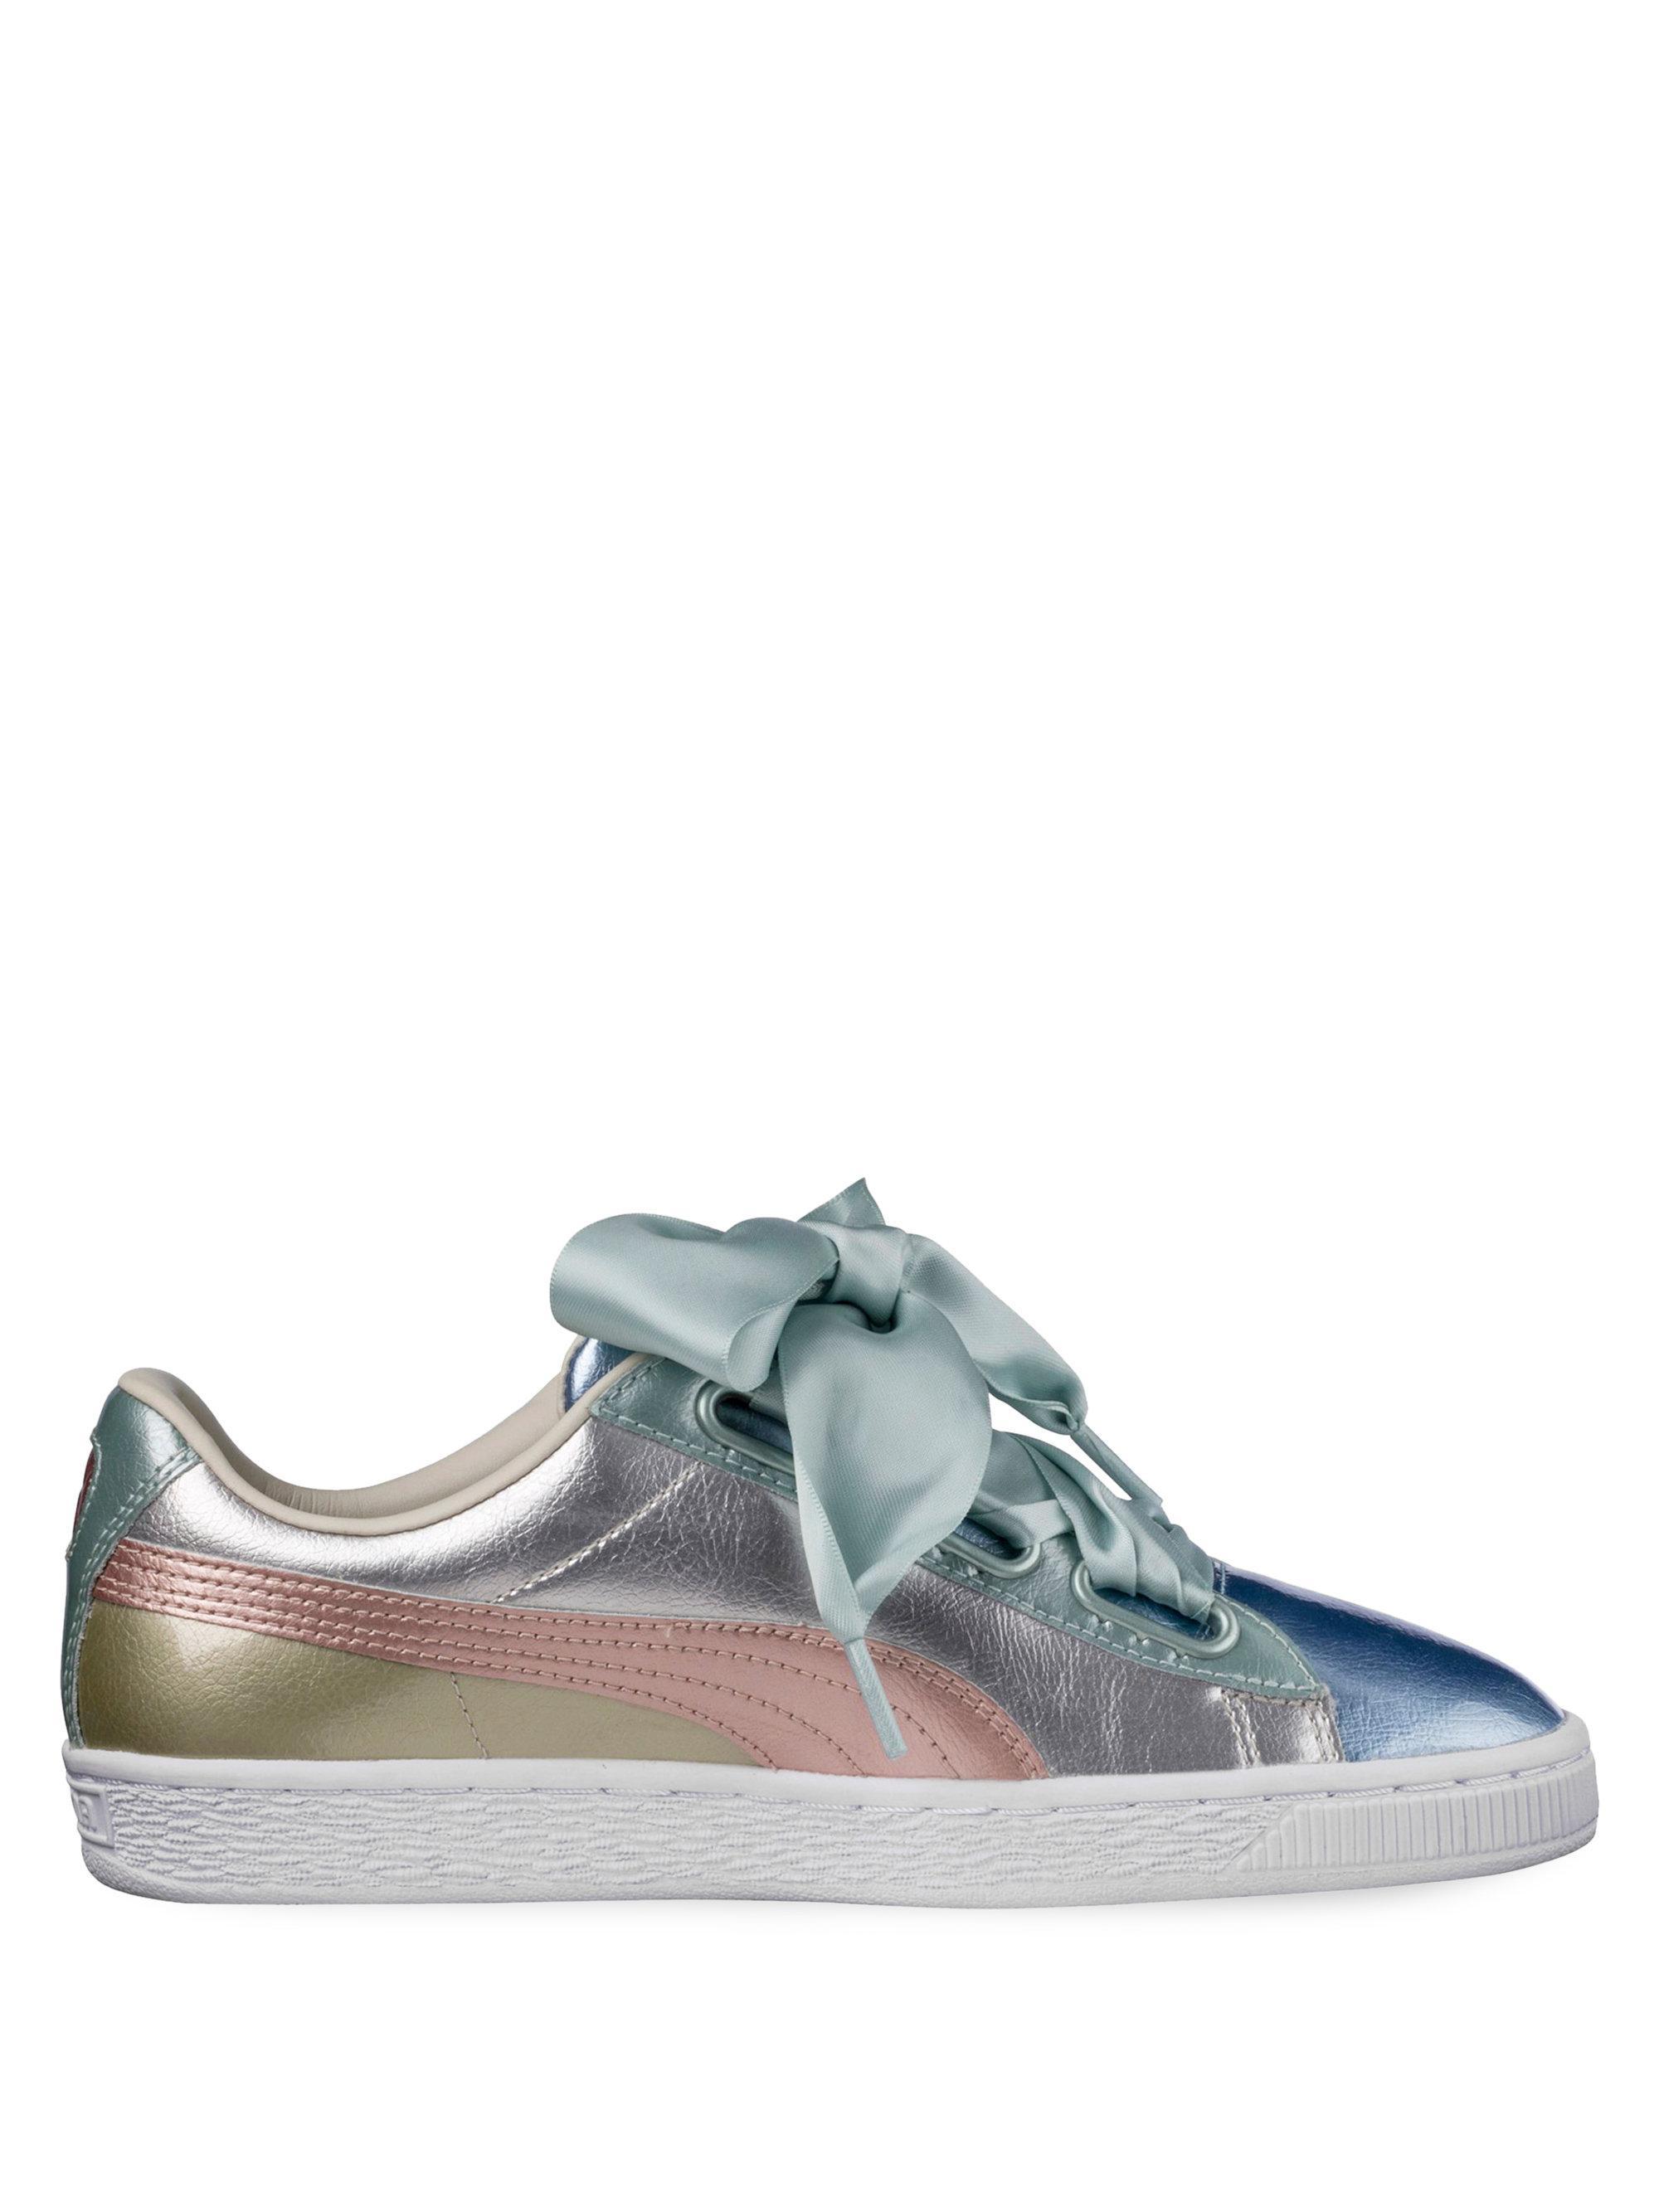 eef38d1ba82af6 Puma Basket Heart Leather Sneakers in Metallic - Lyst